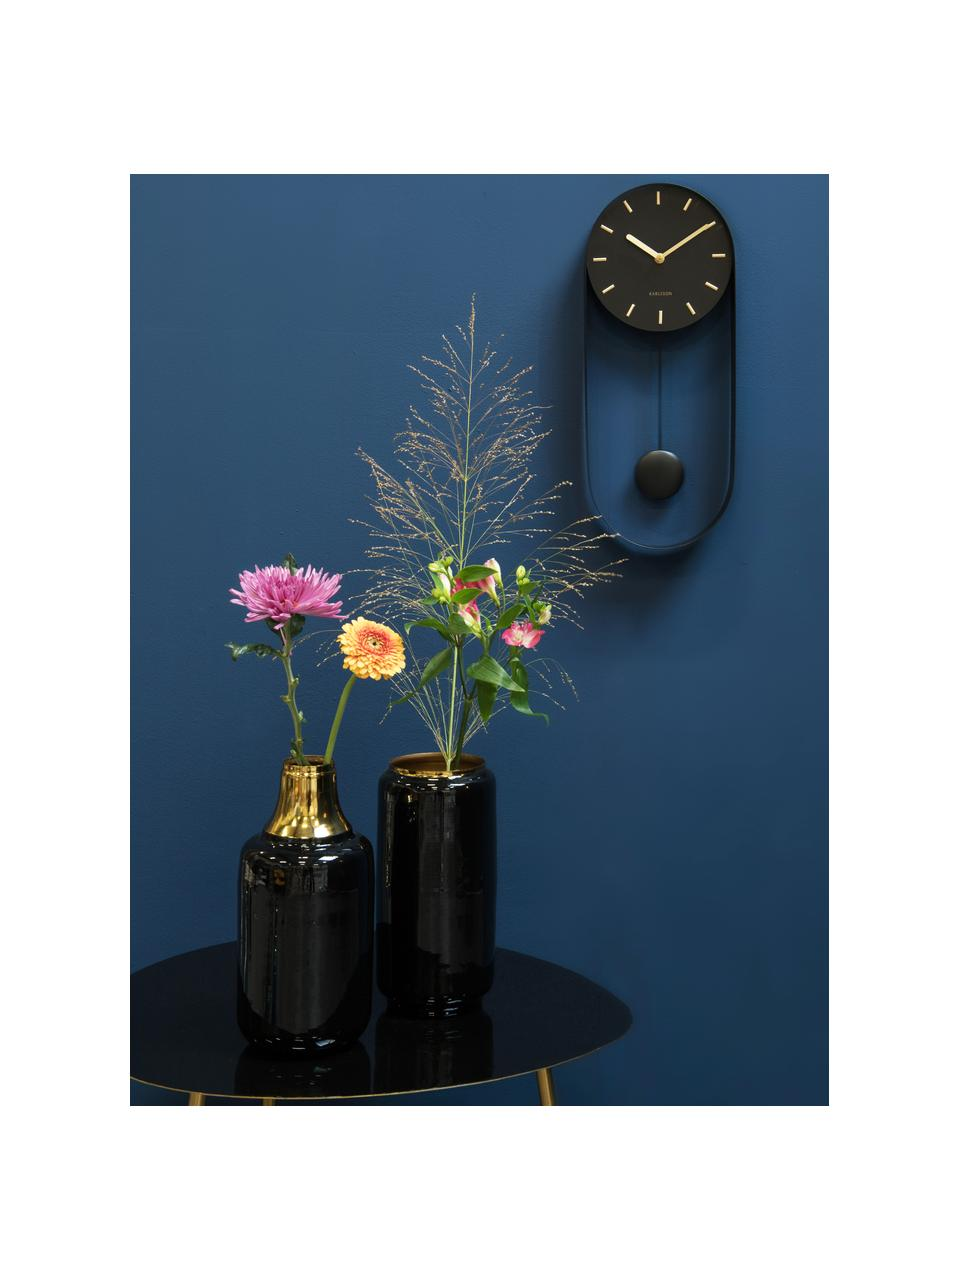 Wanduhr Charm, Metall, beschichtet, Schwarz, Goldfarben, 20 x 50 cm